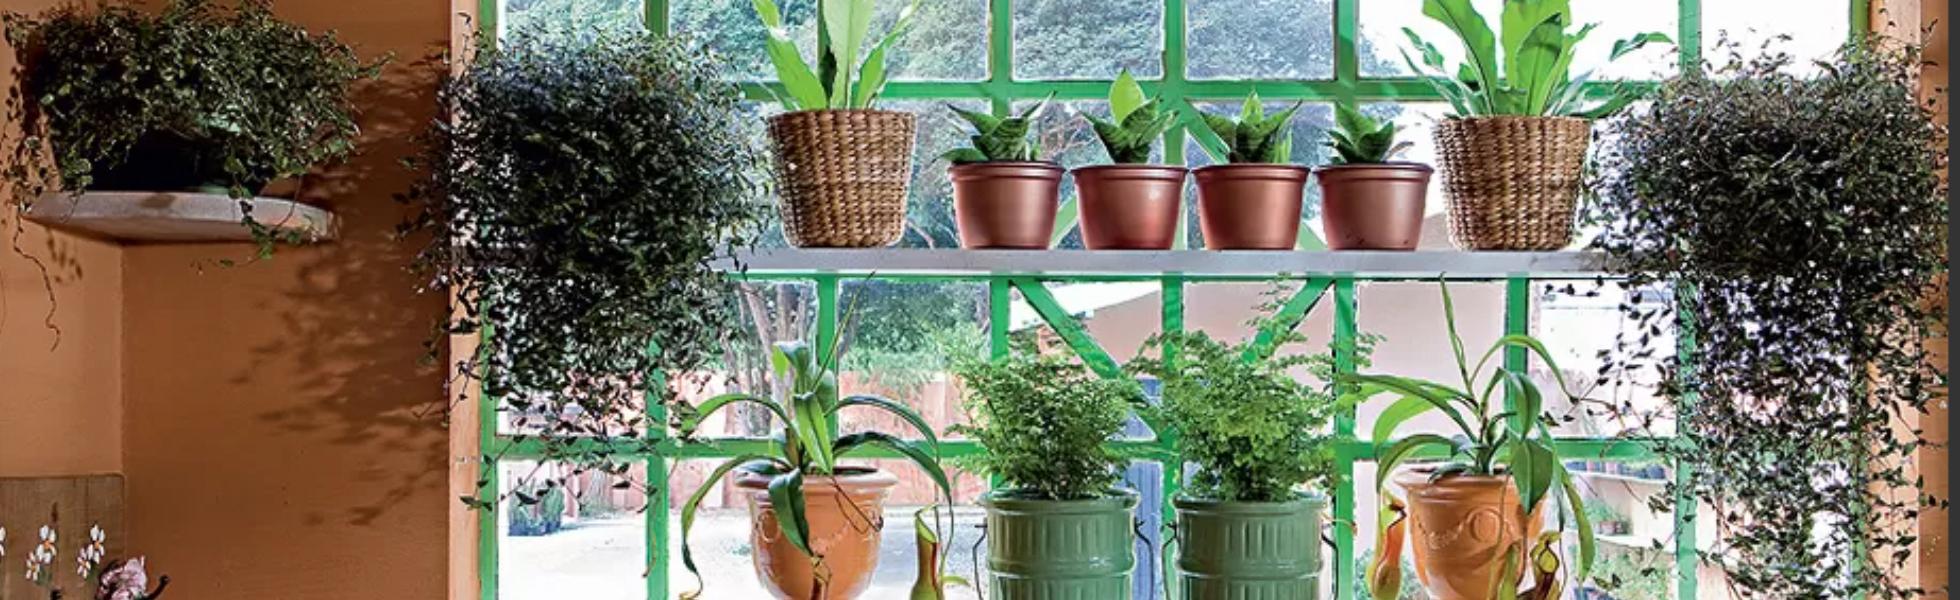 capa-decor-planta